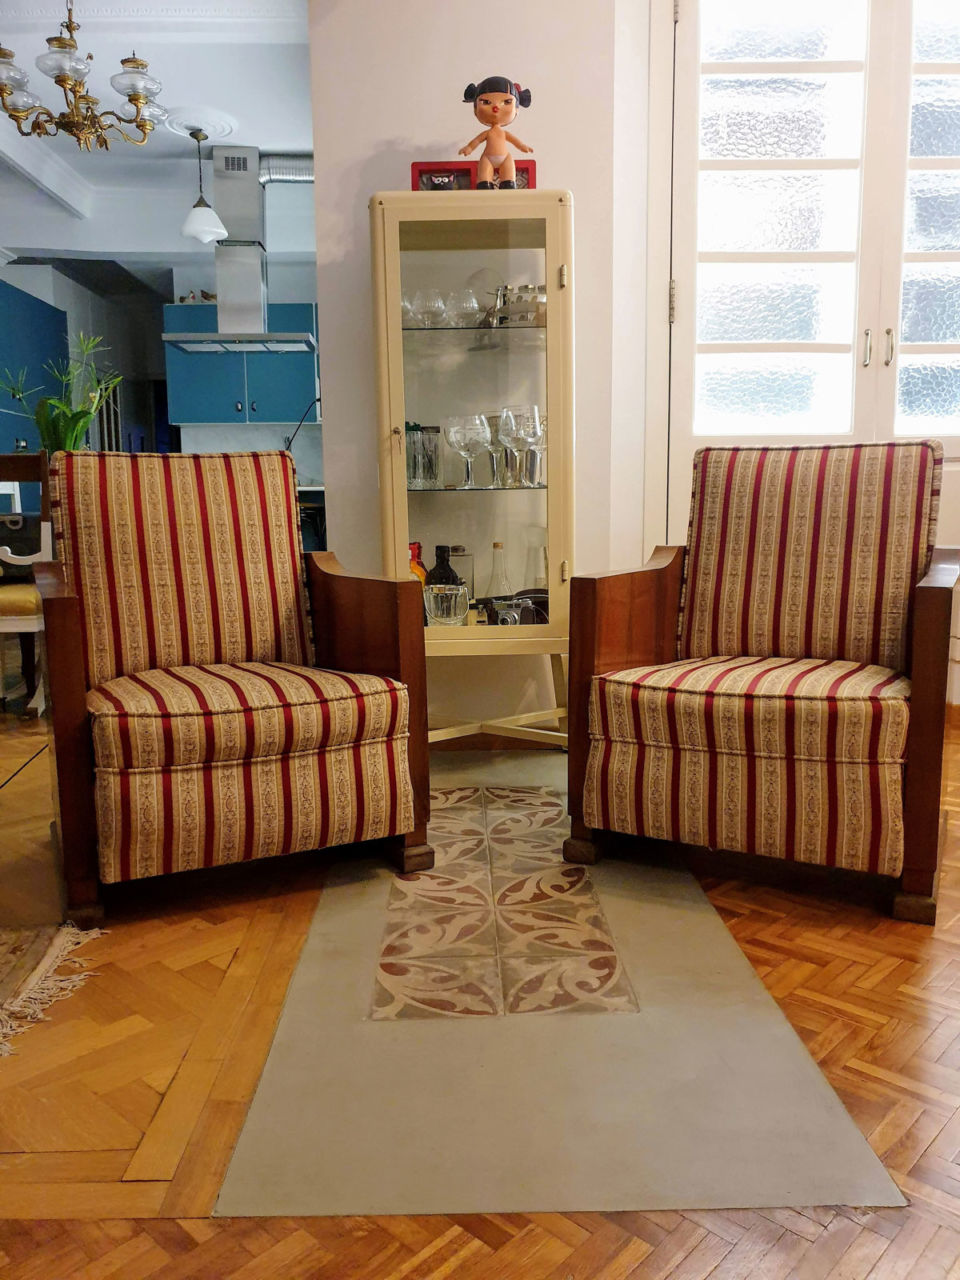 Proyecto interiorismo. Salón